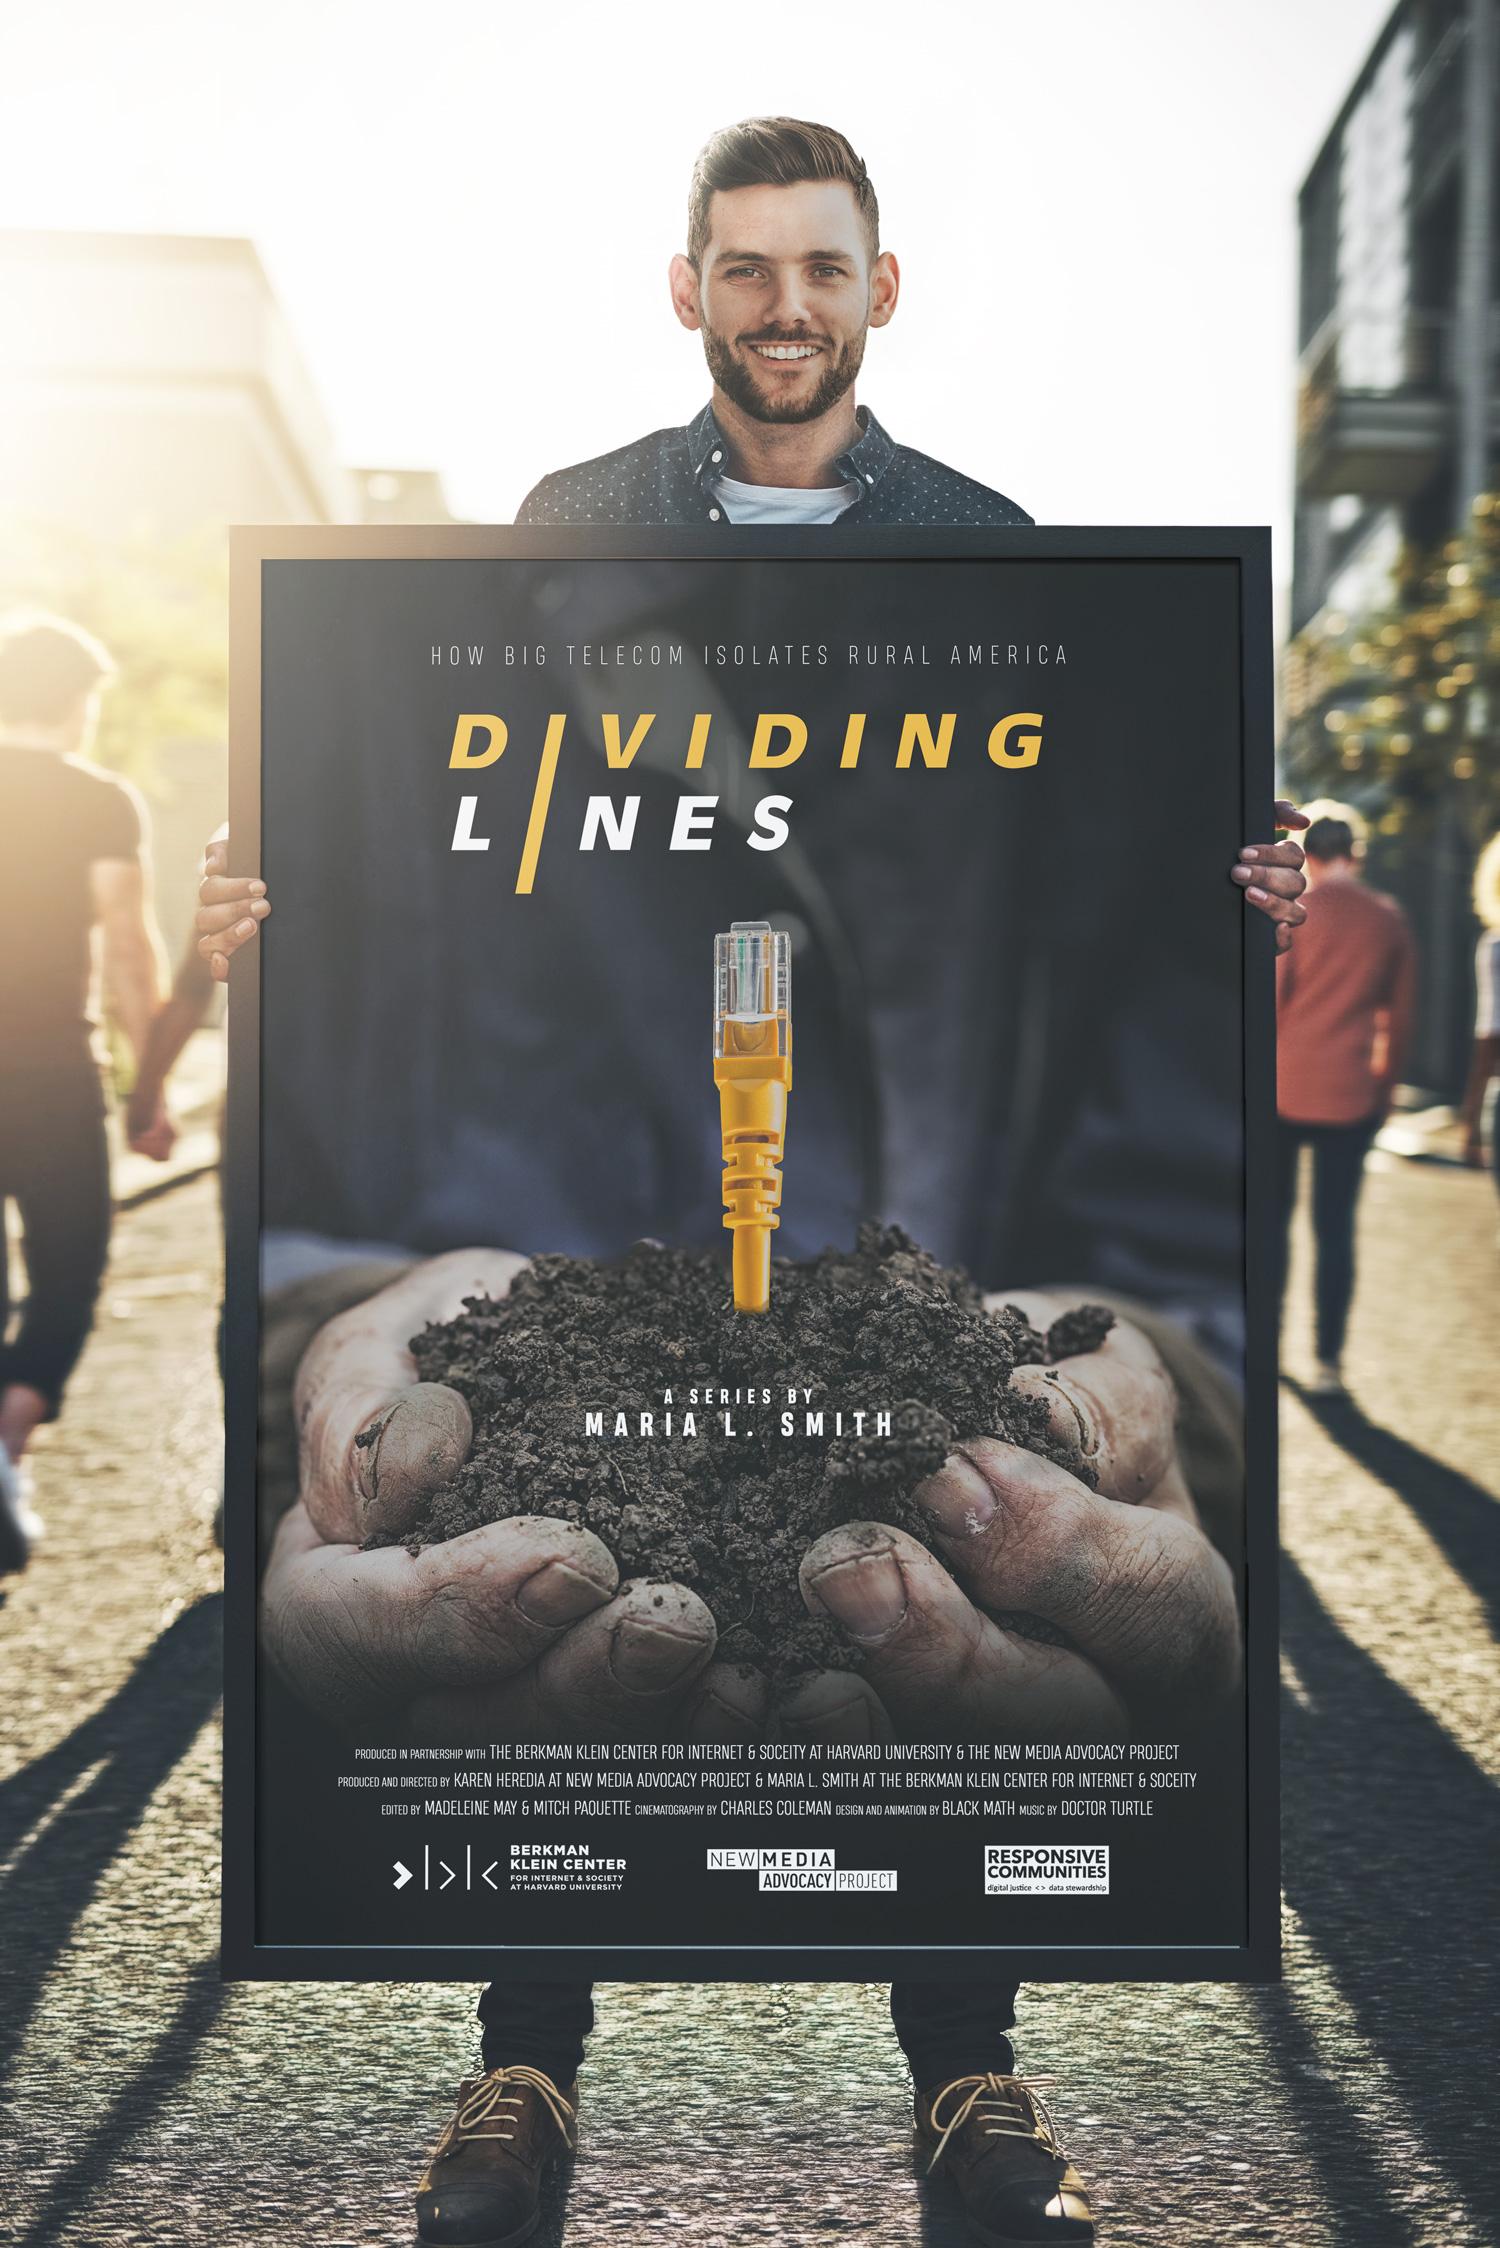 DividingLines_Poster_Photo.jpg